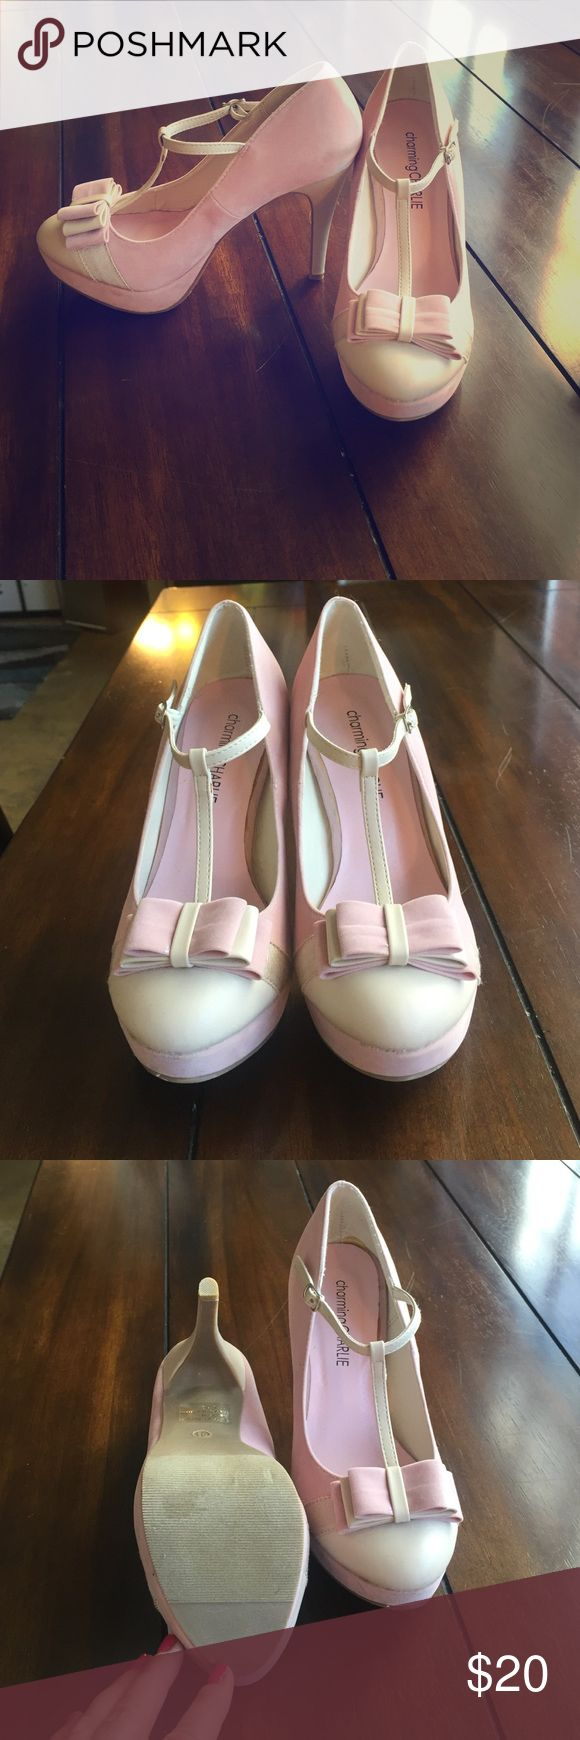 Selling this Charming Charlie platform heels. Never worn!!! on Poshmark! My username is: joannasnook. #shopmycloset #poshmark #fashion #shopping #style #forsale #Charming Charlie #Shoes